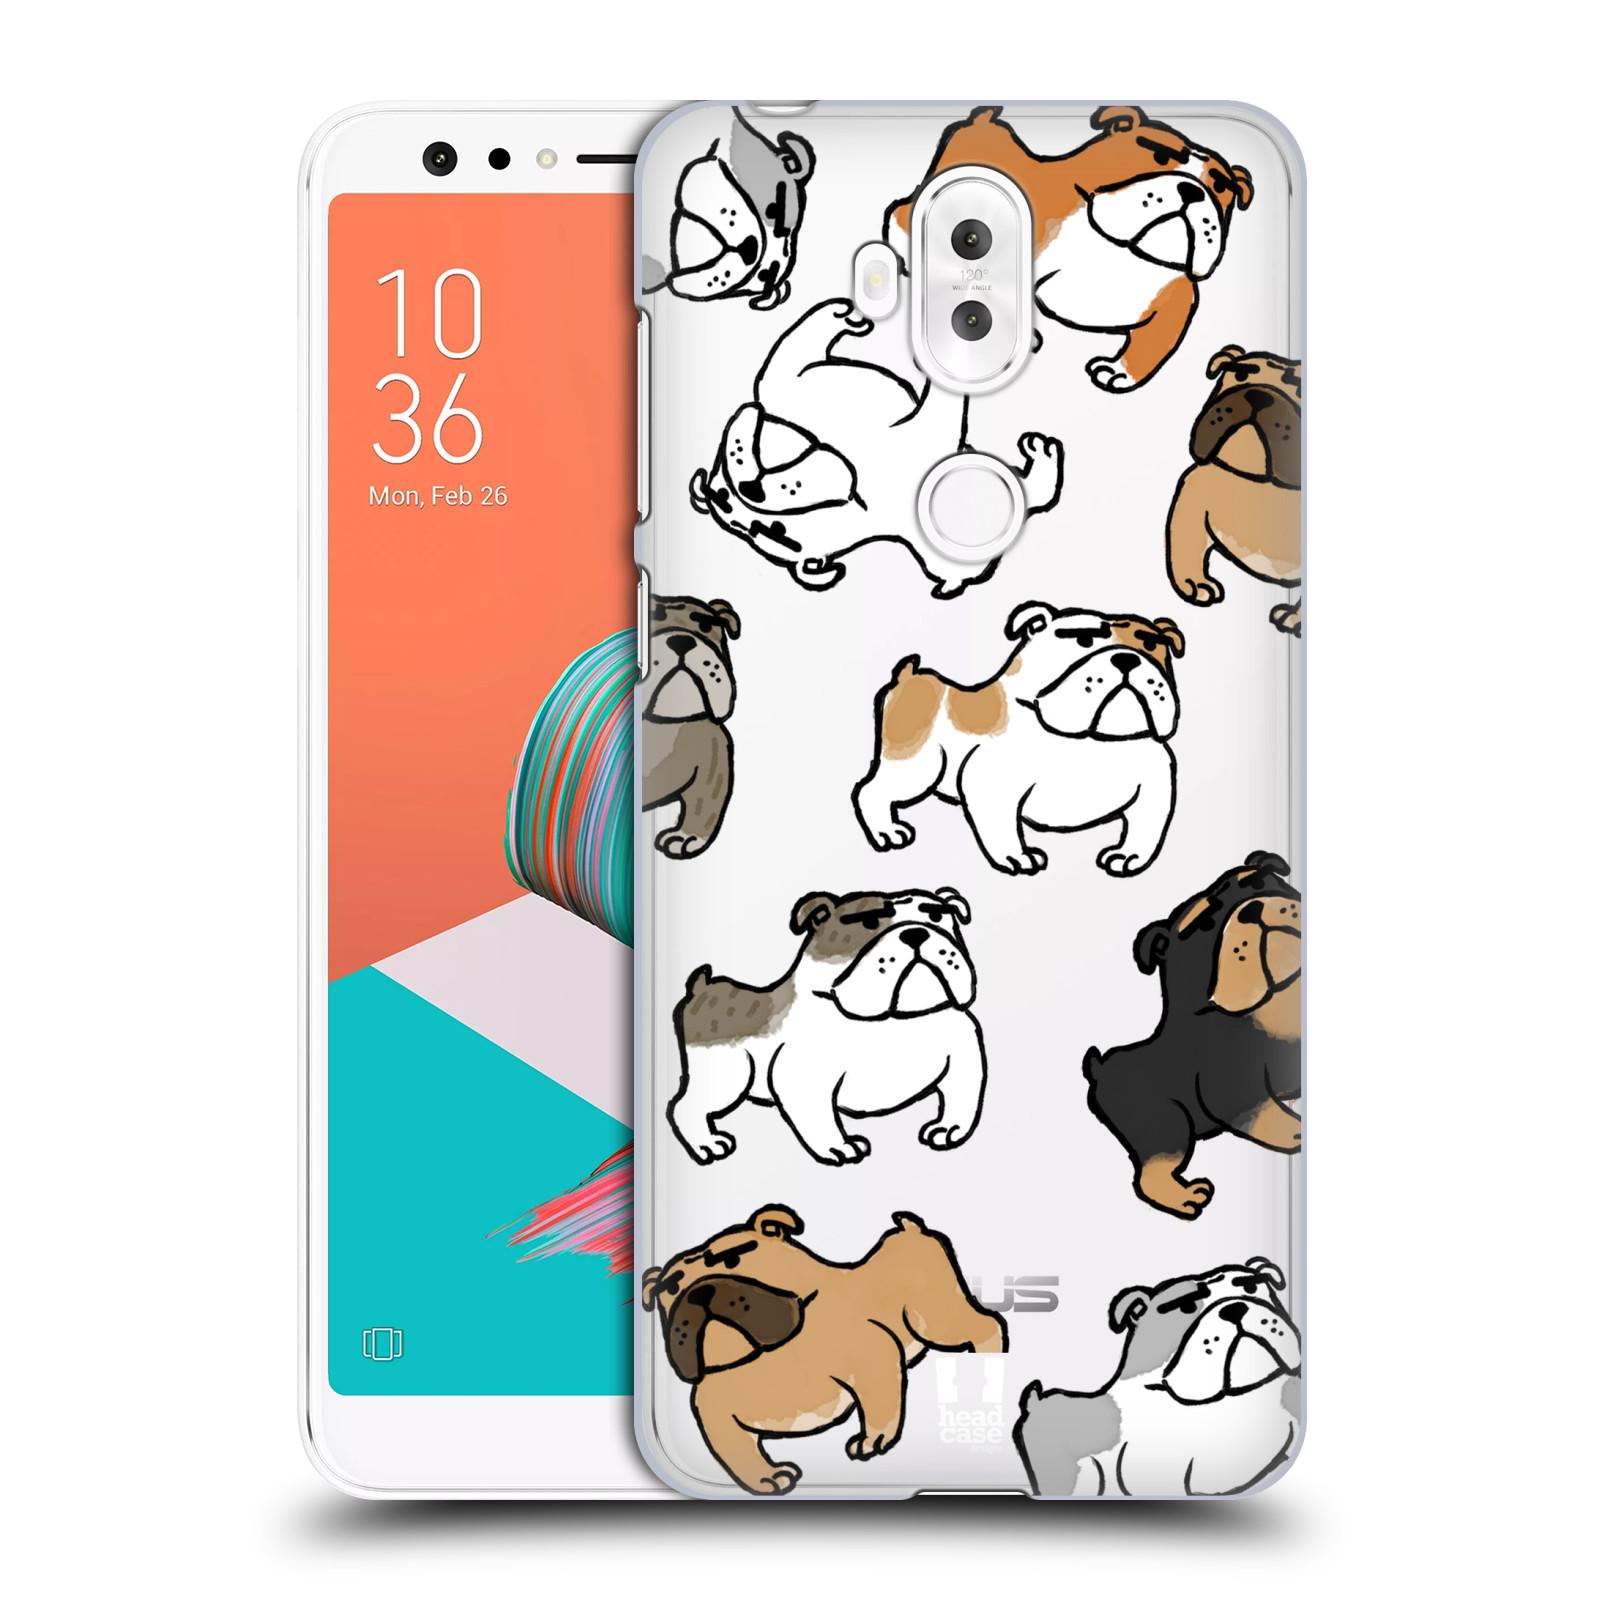 Plastové pouzdro na mobil Asus ZenFone 5 Lite ZC600KL - Head Case - Buldoci (Plastový kryt či obal na mobilní telefon Asus ZenFone 5 Lite (ZC600KL) s motivem Buldoci)